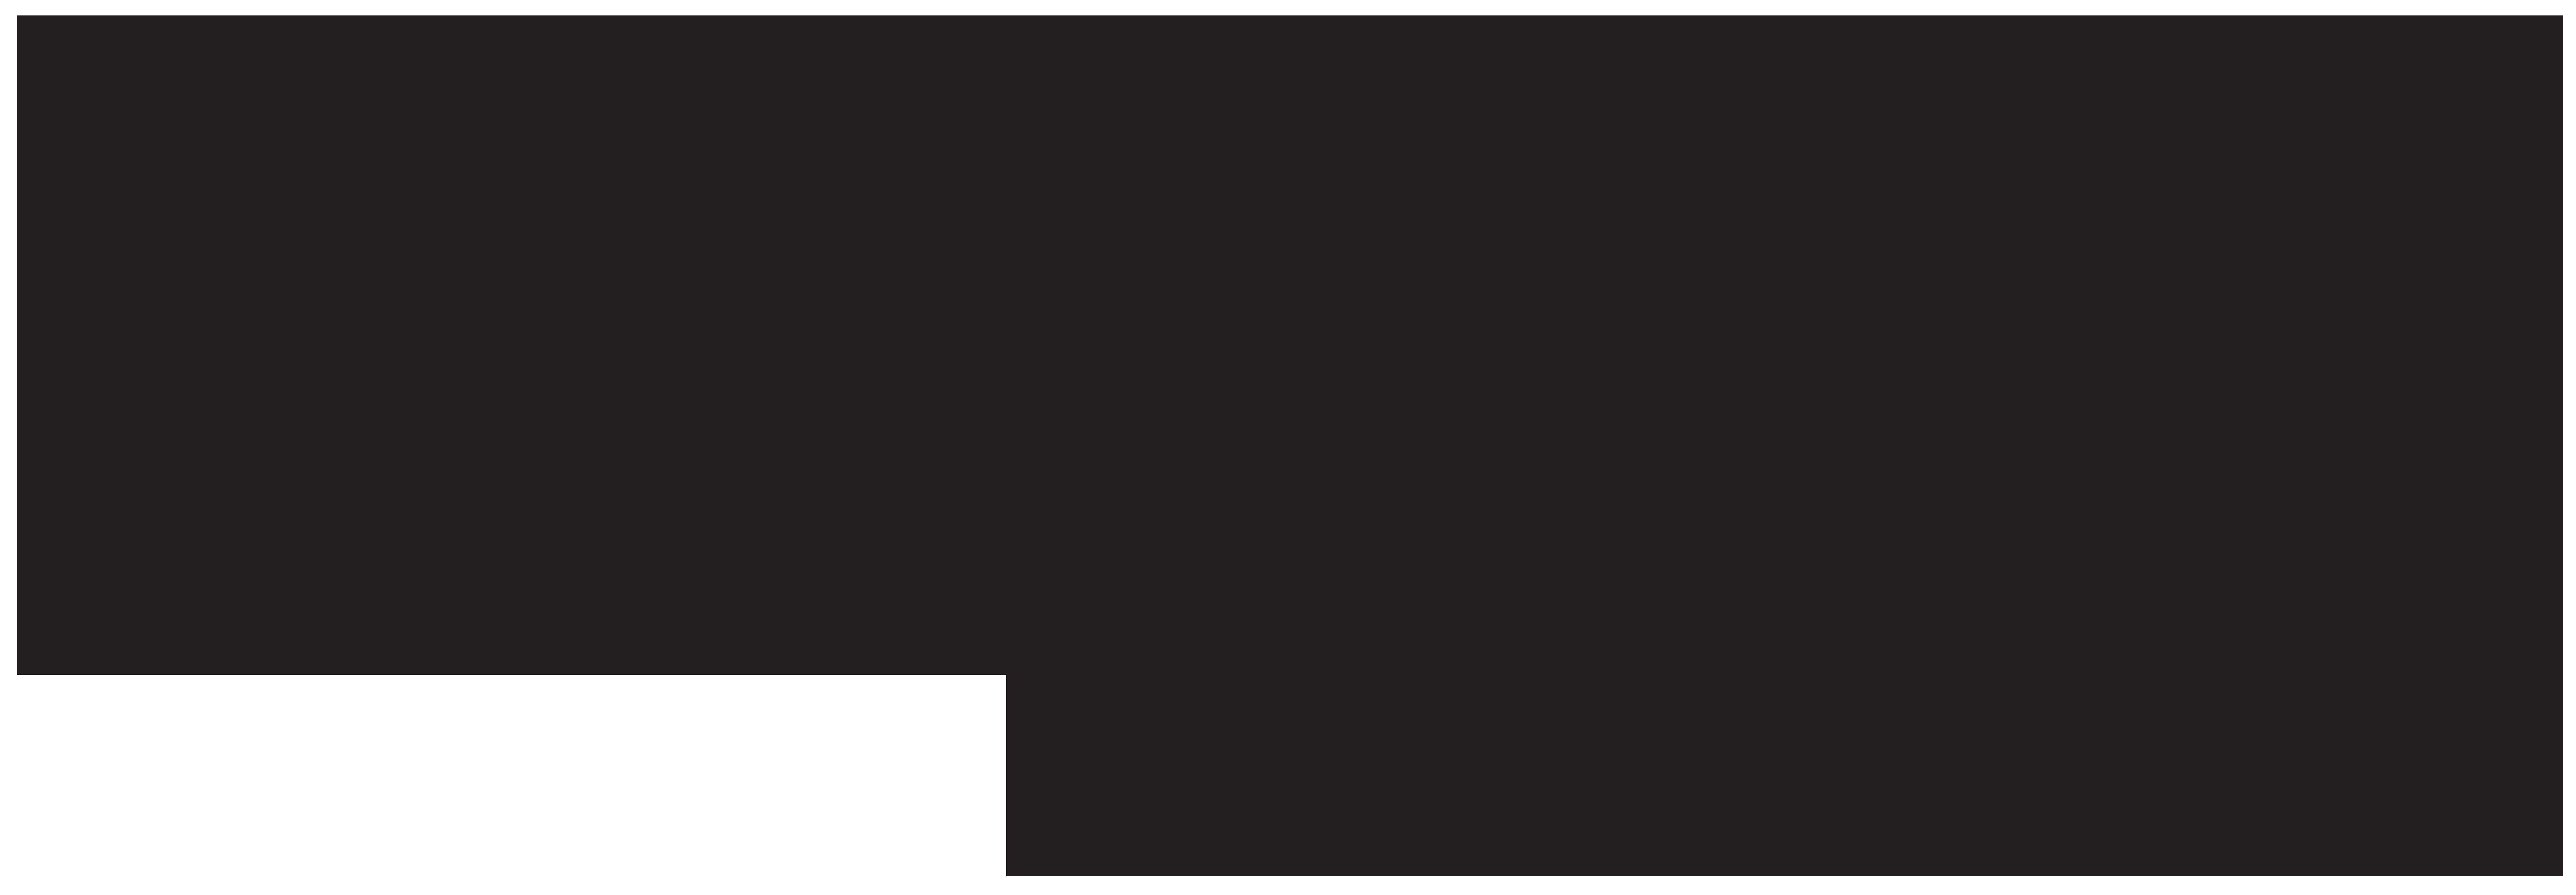 Claus christmas clip art. Santa clipart deer